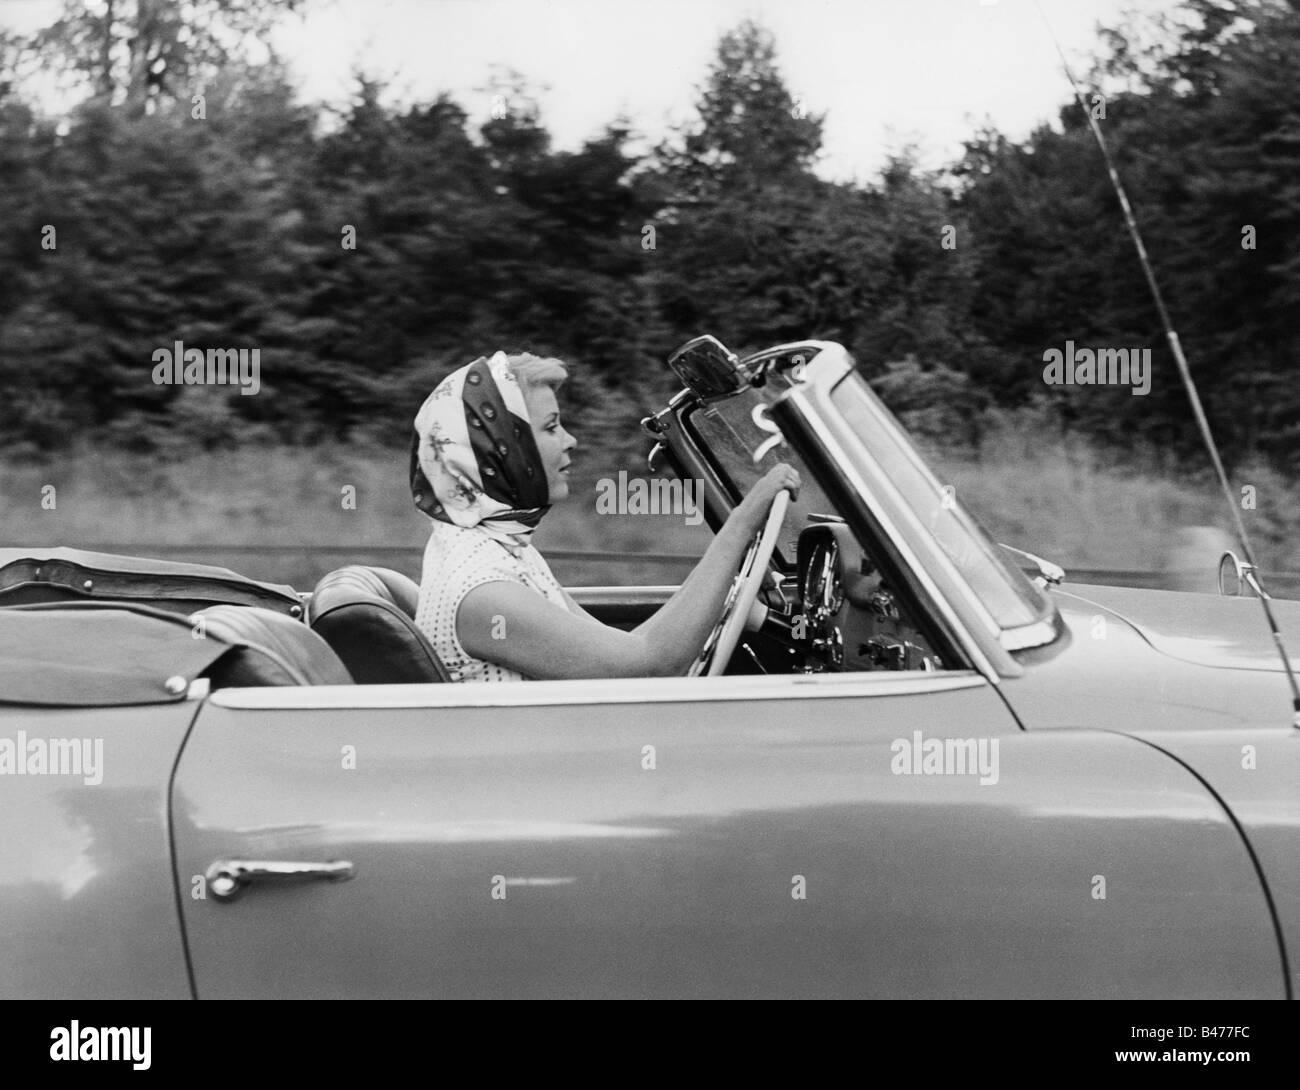 Frydtberg, Wera, 11.8.1926 - 16.6.2008, German actress, half length, 1959, Additional-Rights-Clearances-NA - Stock Image